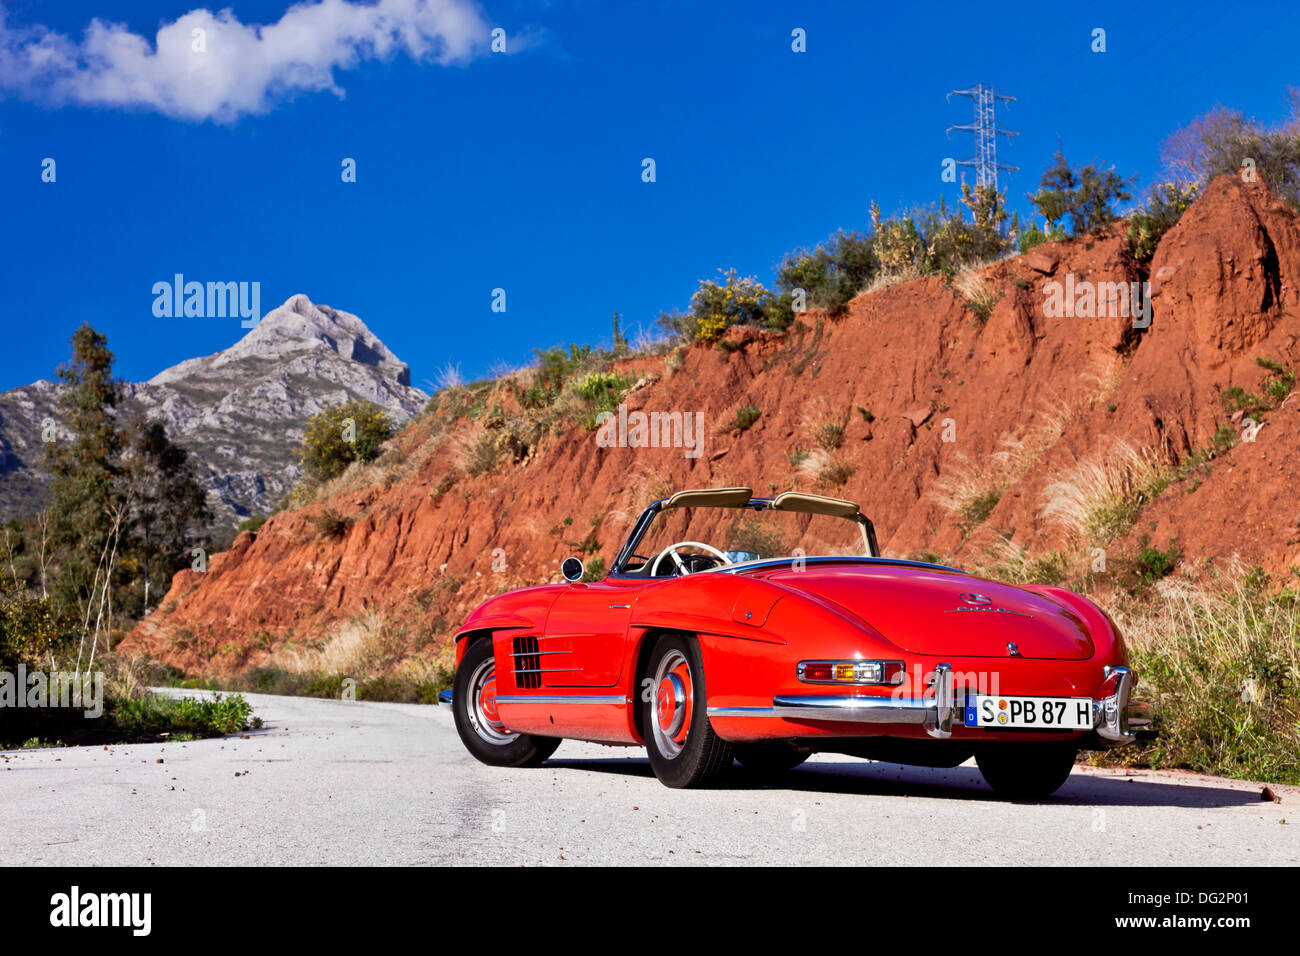 Mercedes 300 SL Roadster, 1961. - Stock Image